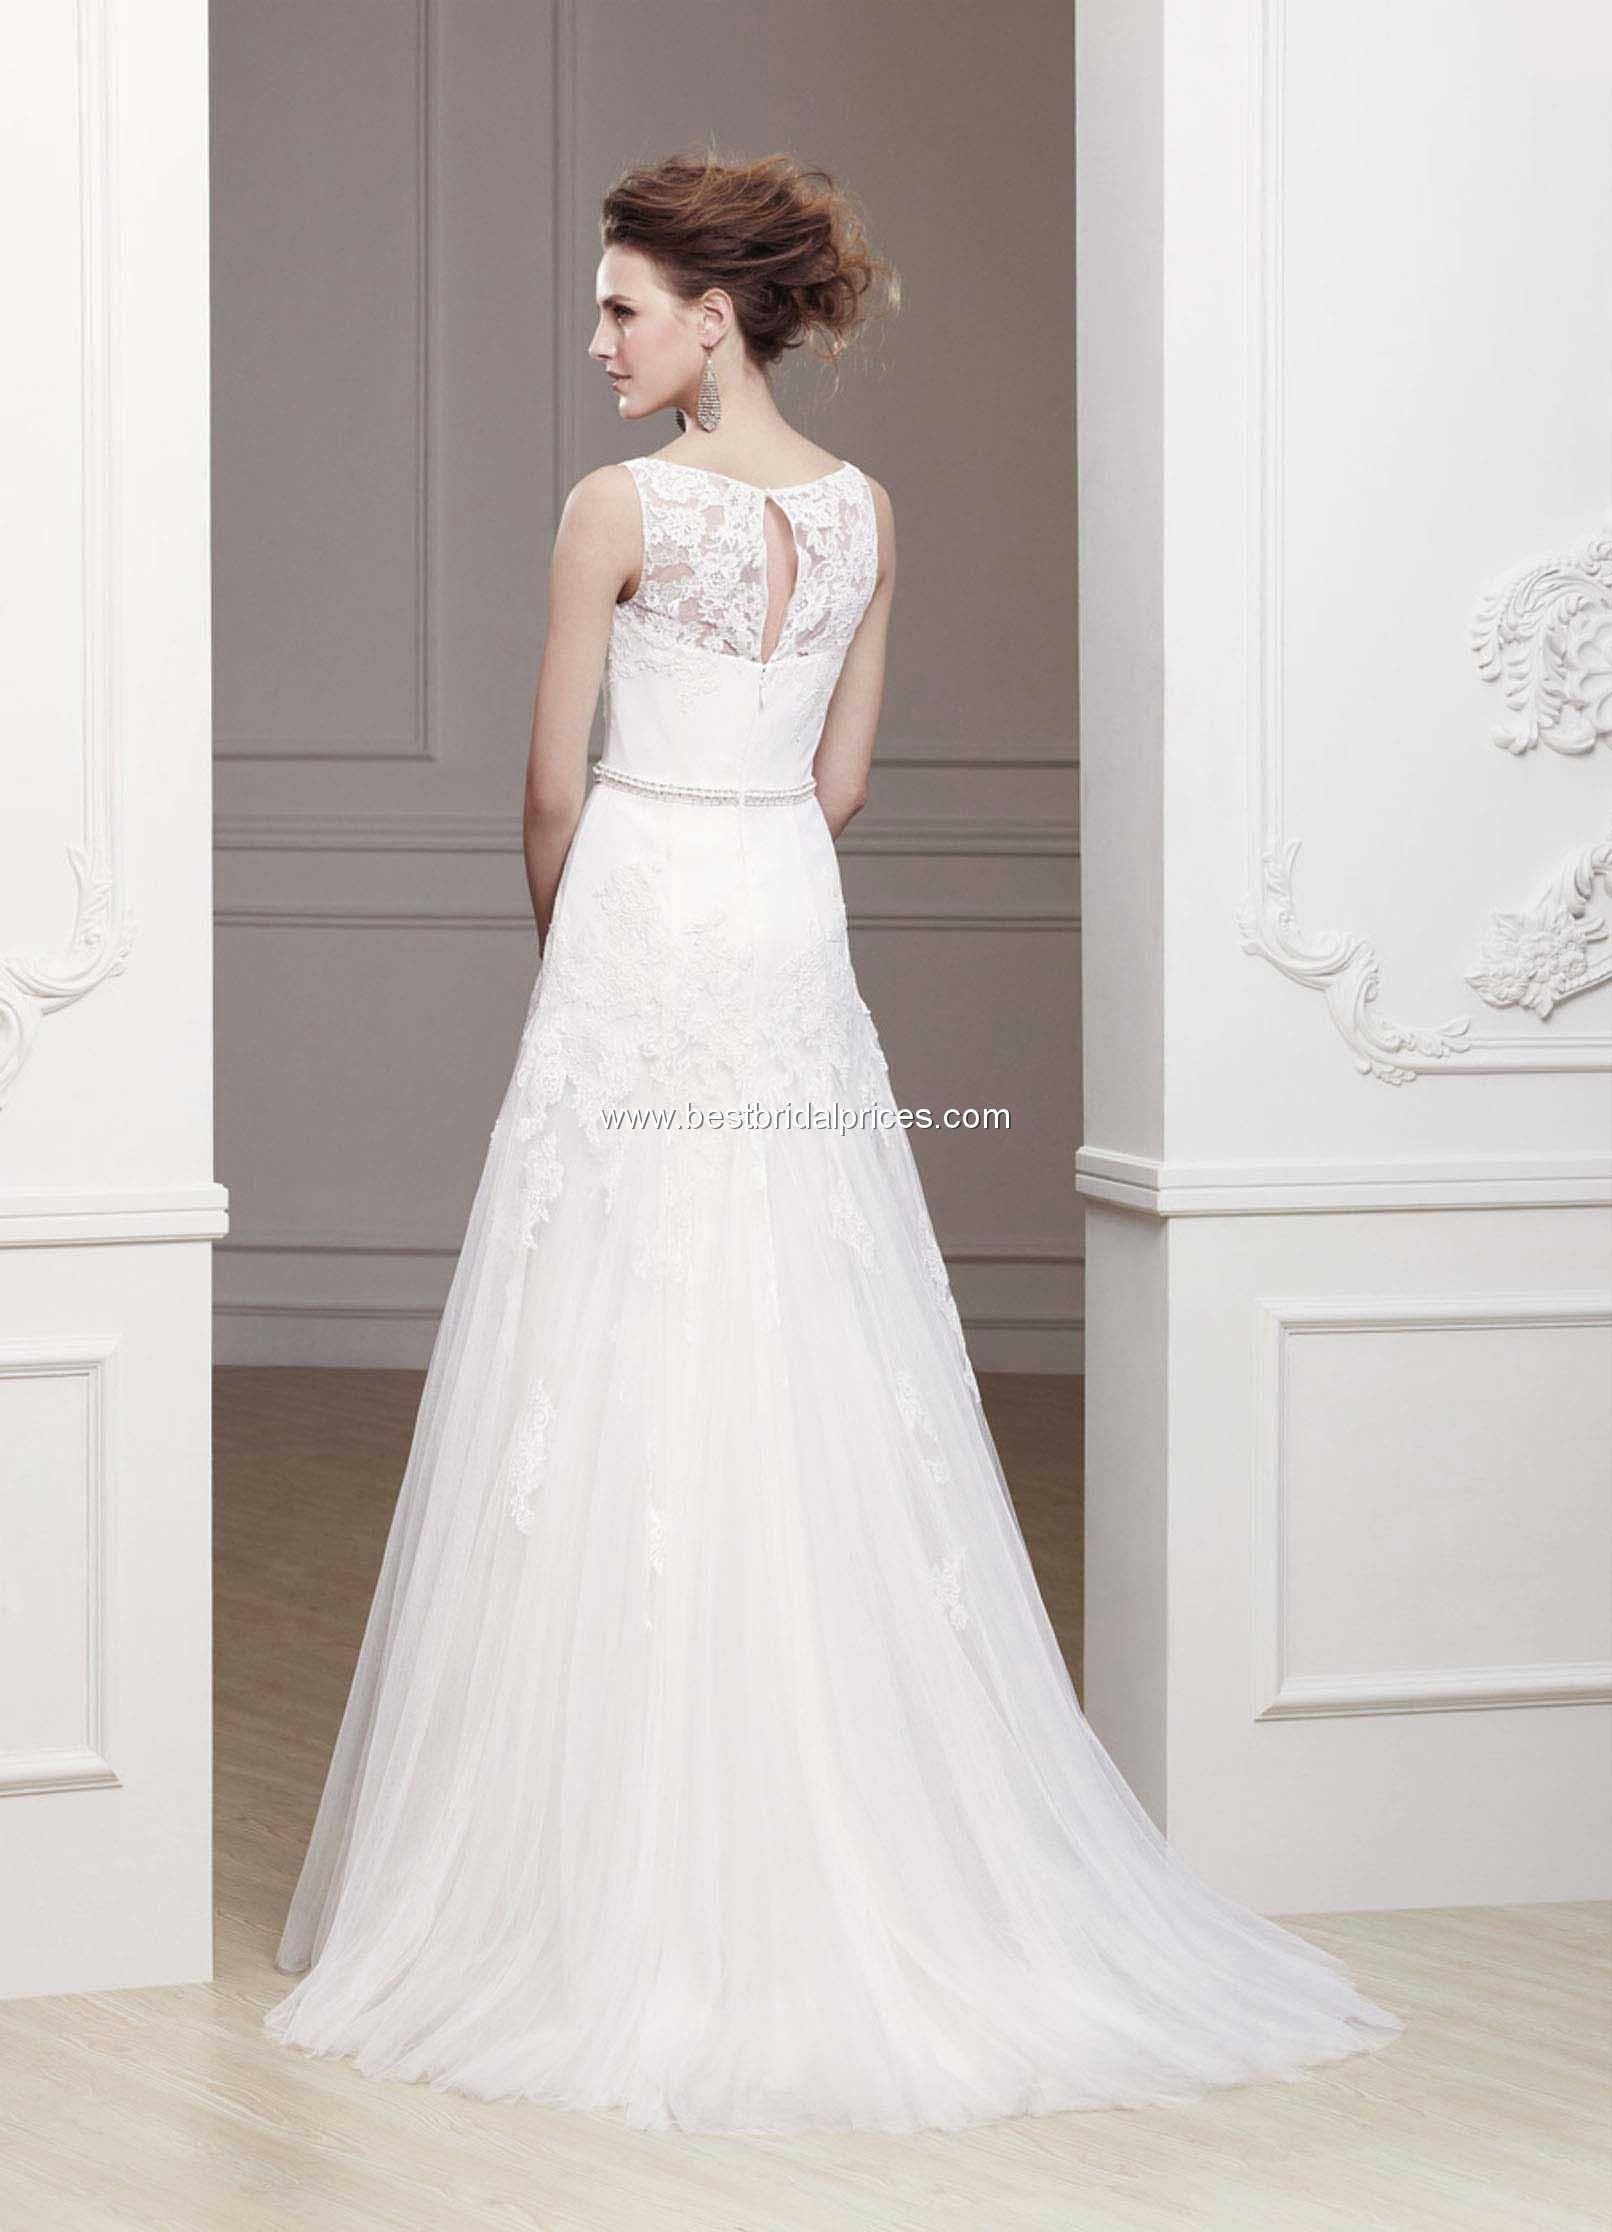 Modeca Wedding Dresses - Style Ola | VeraWedding | Pinterest ...